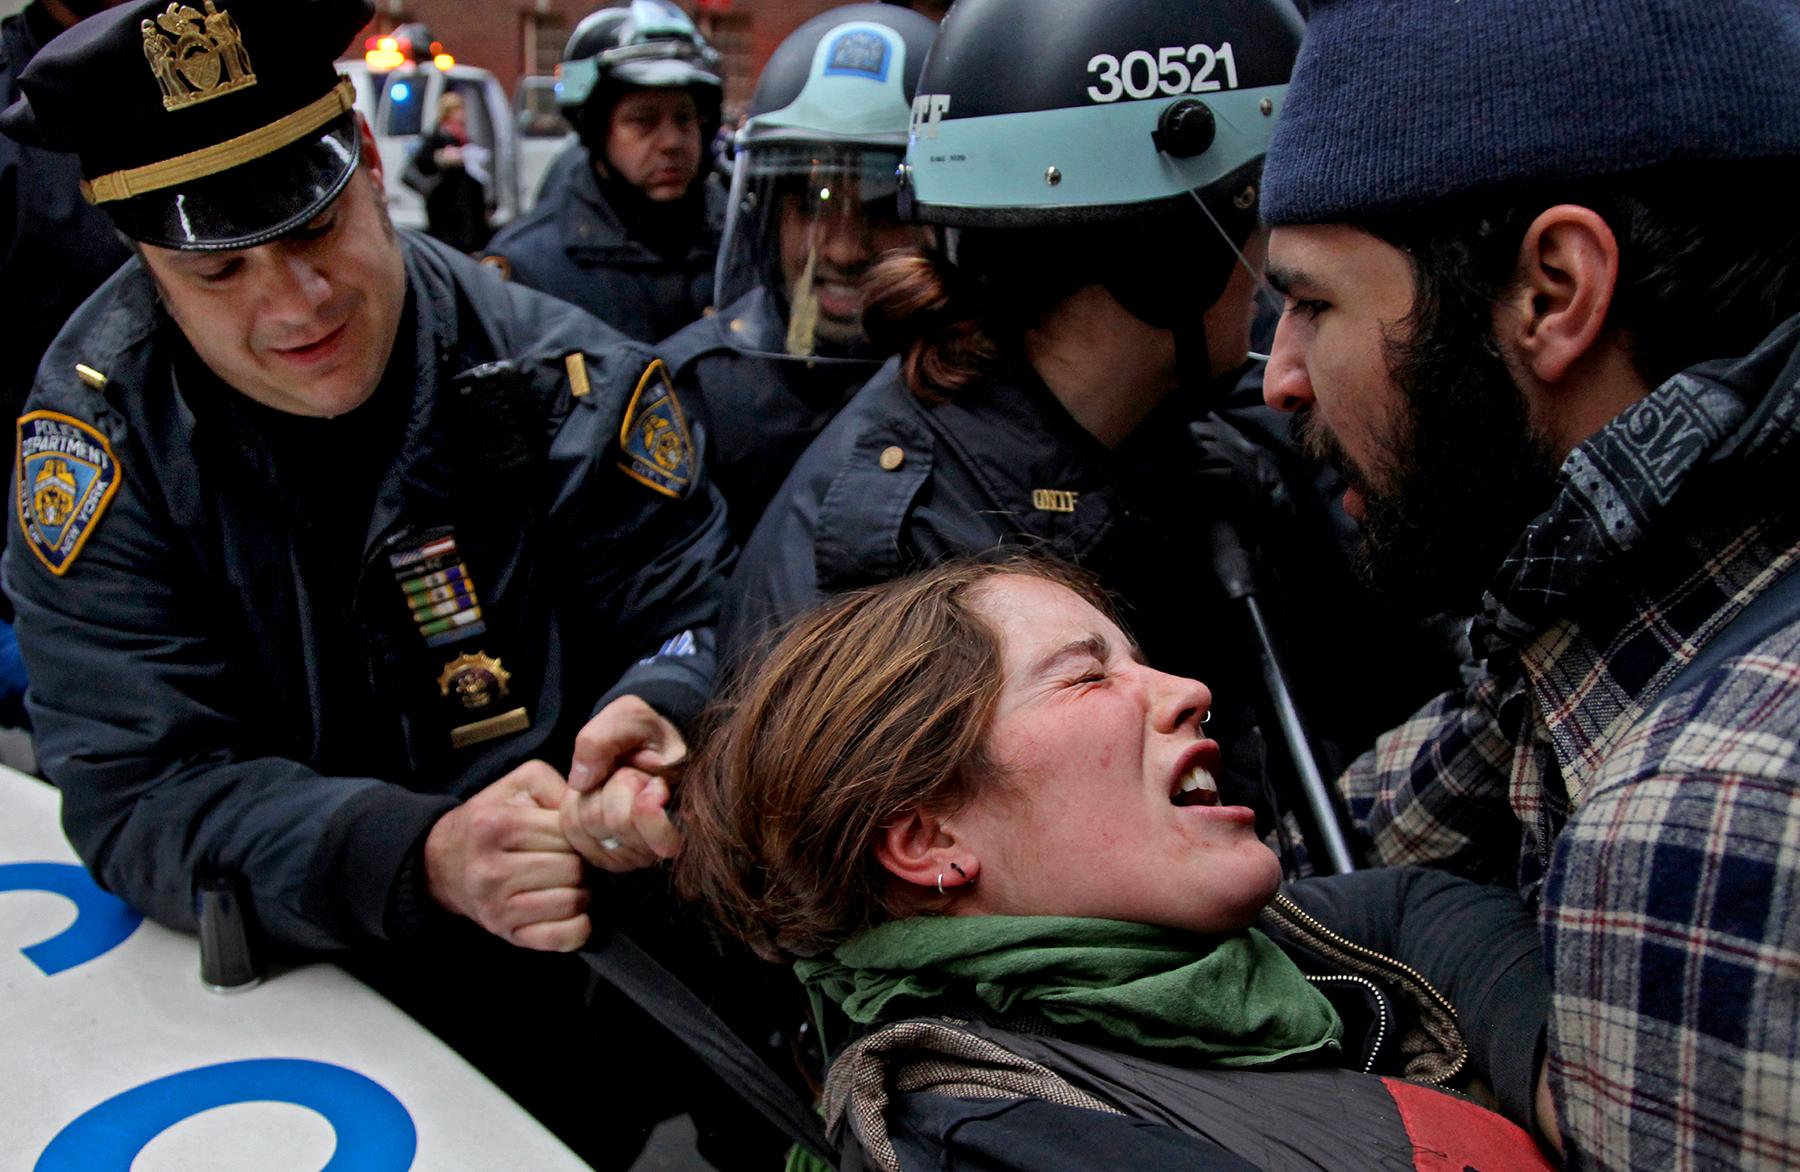 Occupy Wall Street clash, 2011